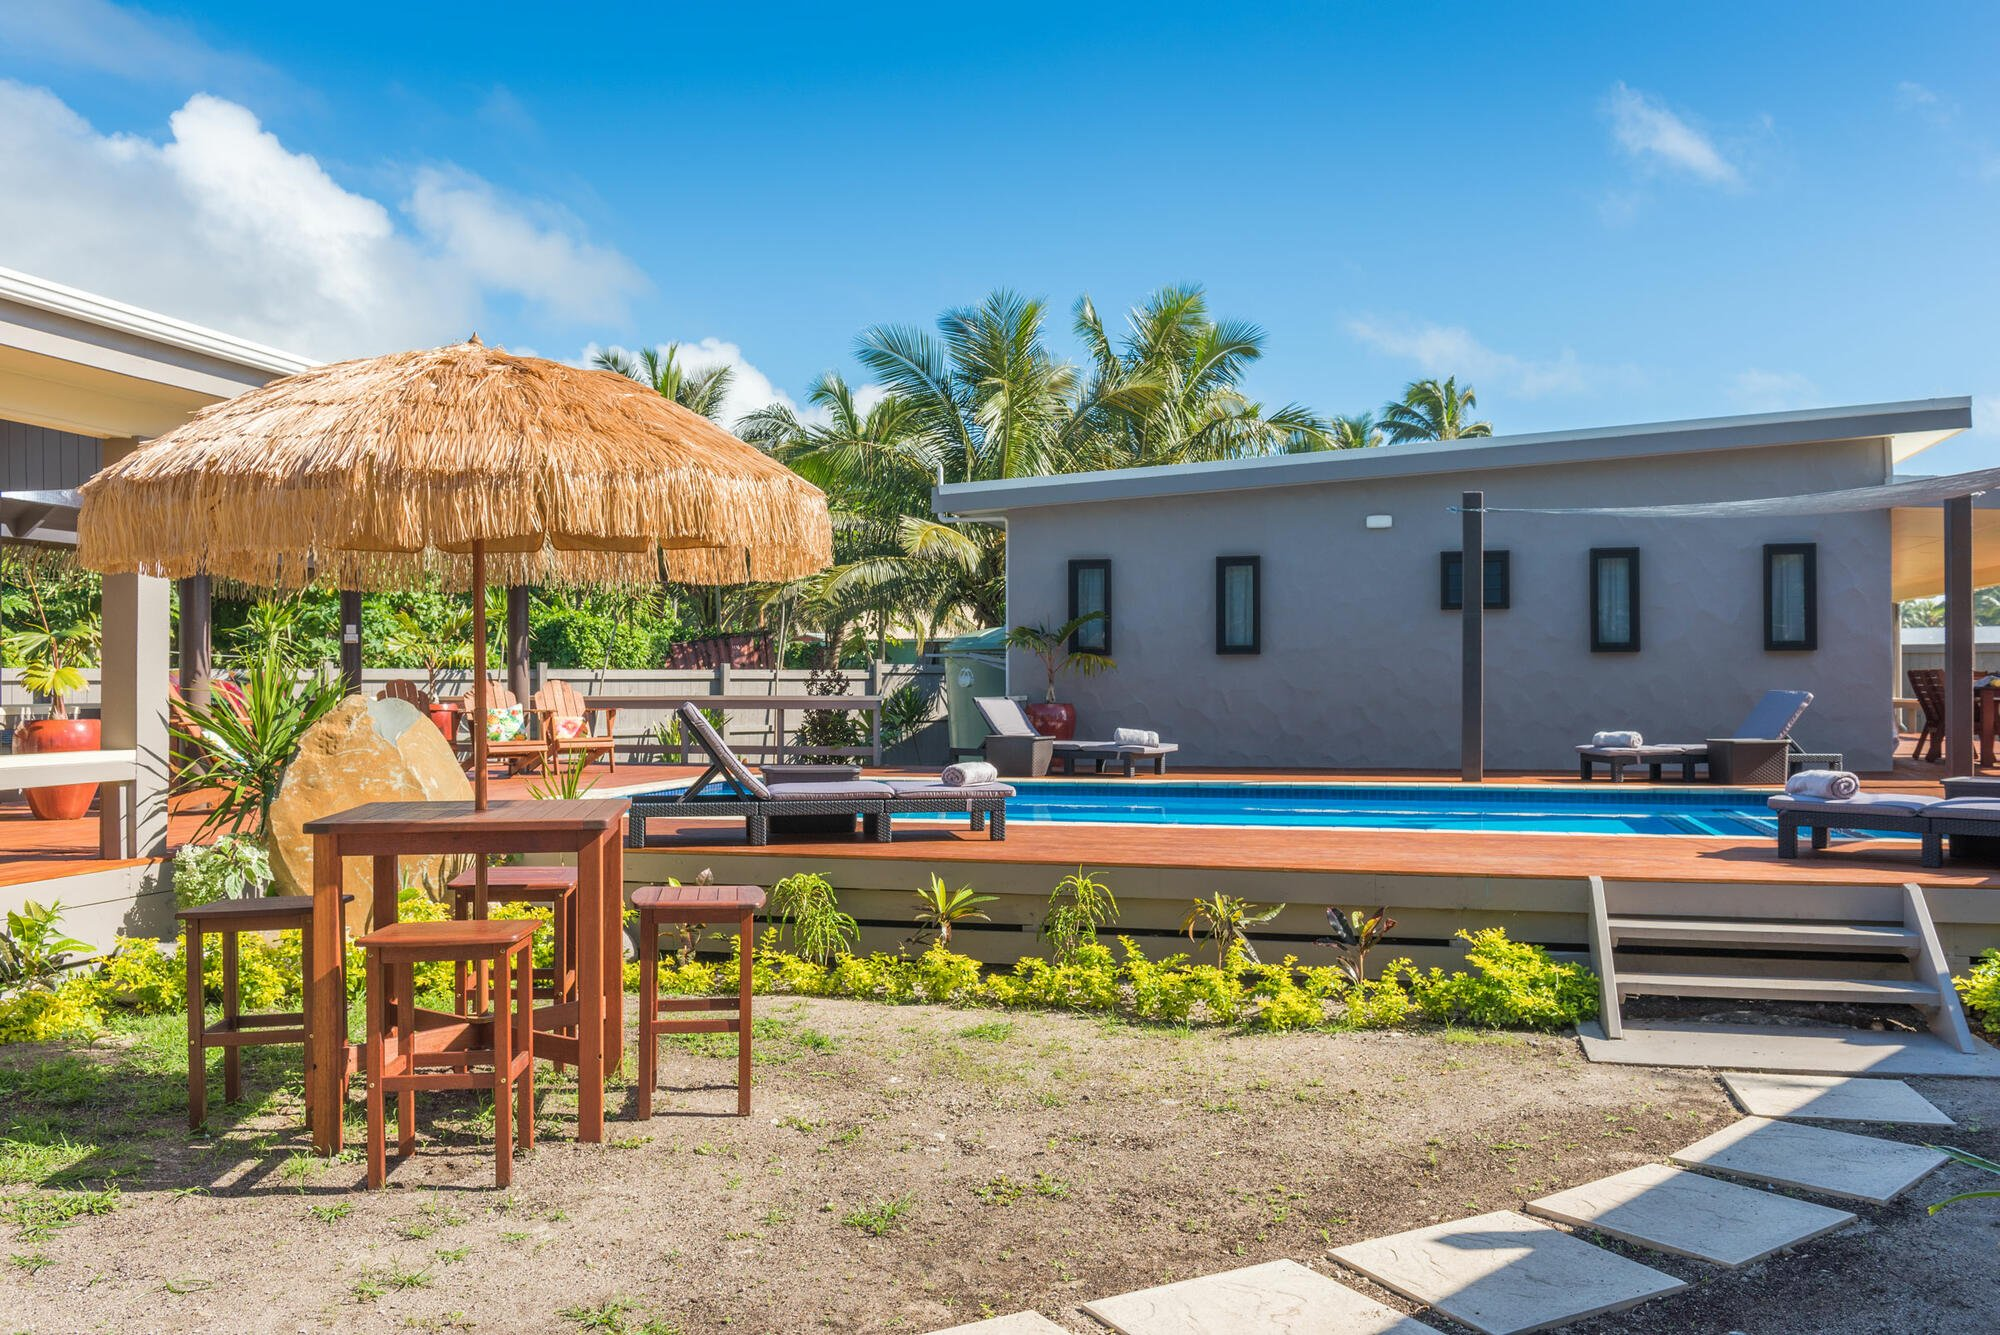 Foto Di Ville Lussuose turangi holiday villas | cook islands